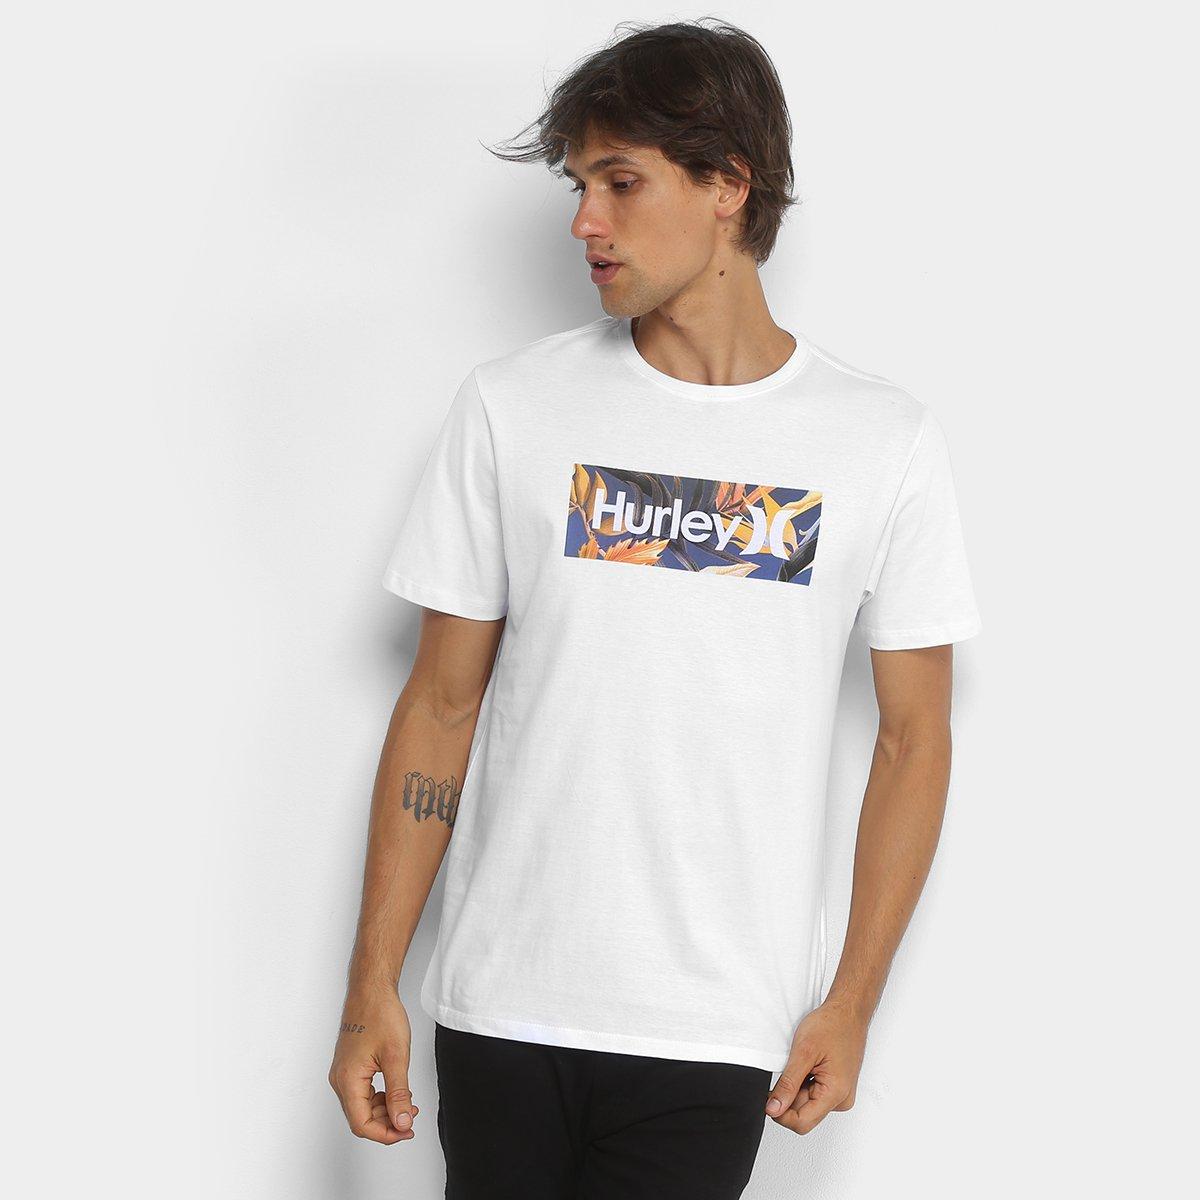 58e4e8fc81 Camiseta Hurley Silk O O Tropic Masculina - Compre Agora